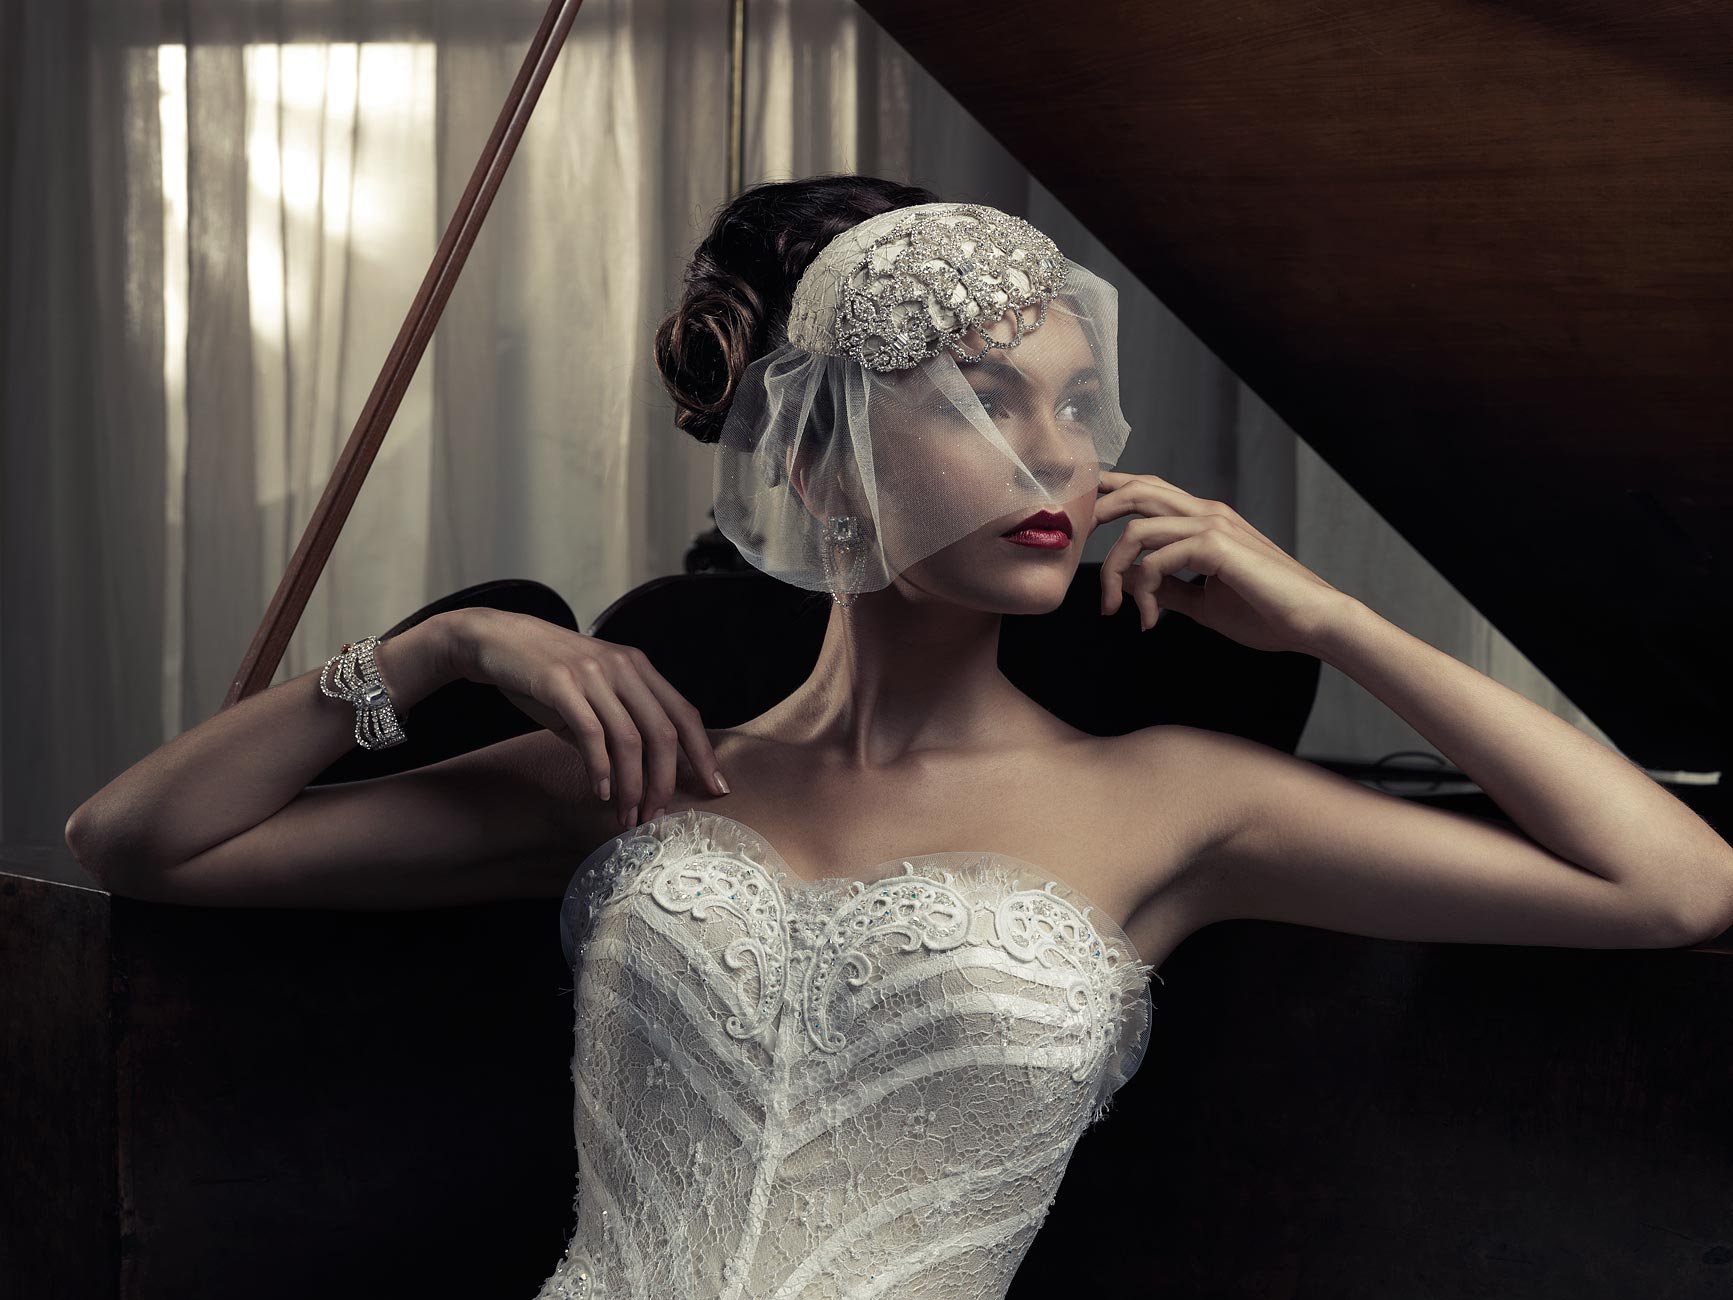 completewedding-fashion-editorial-3.jpg